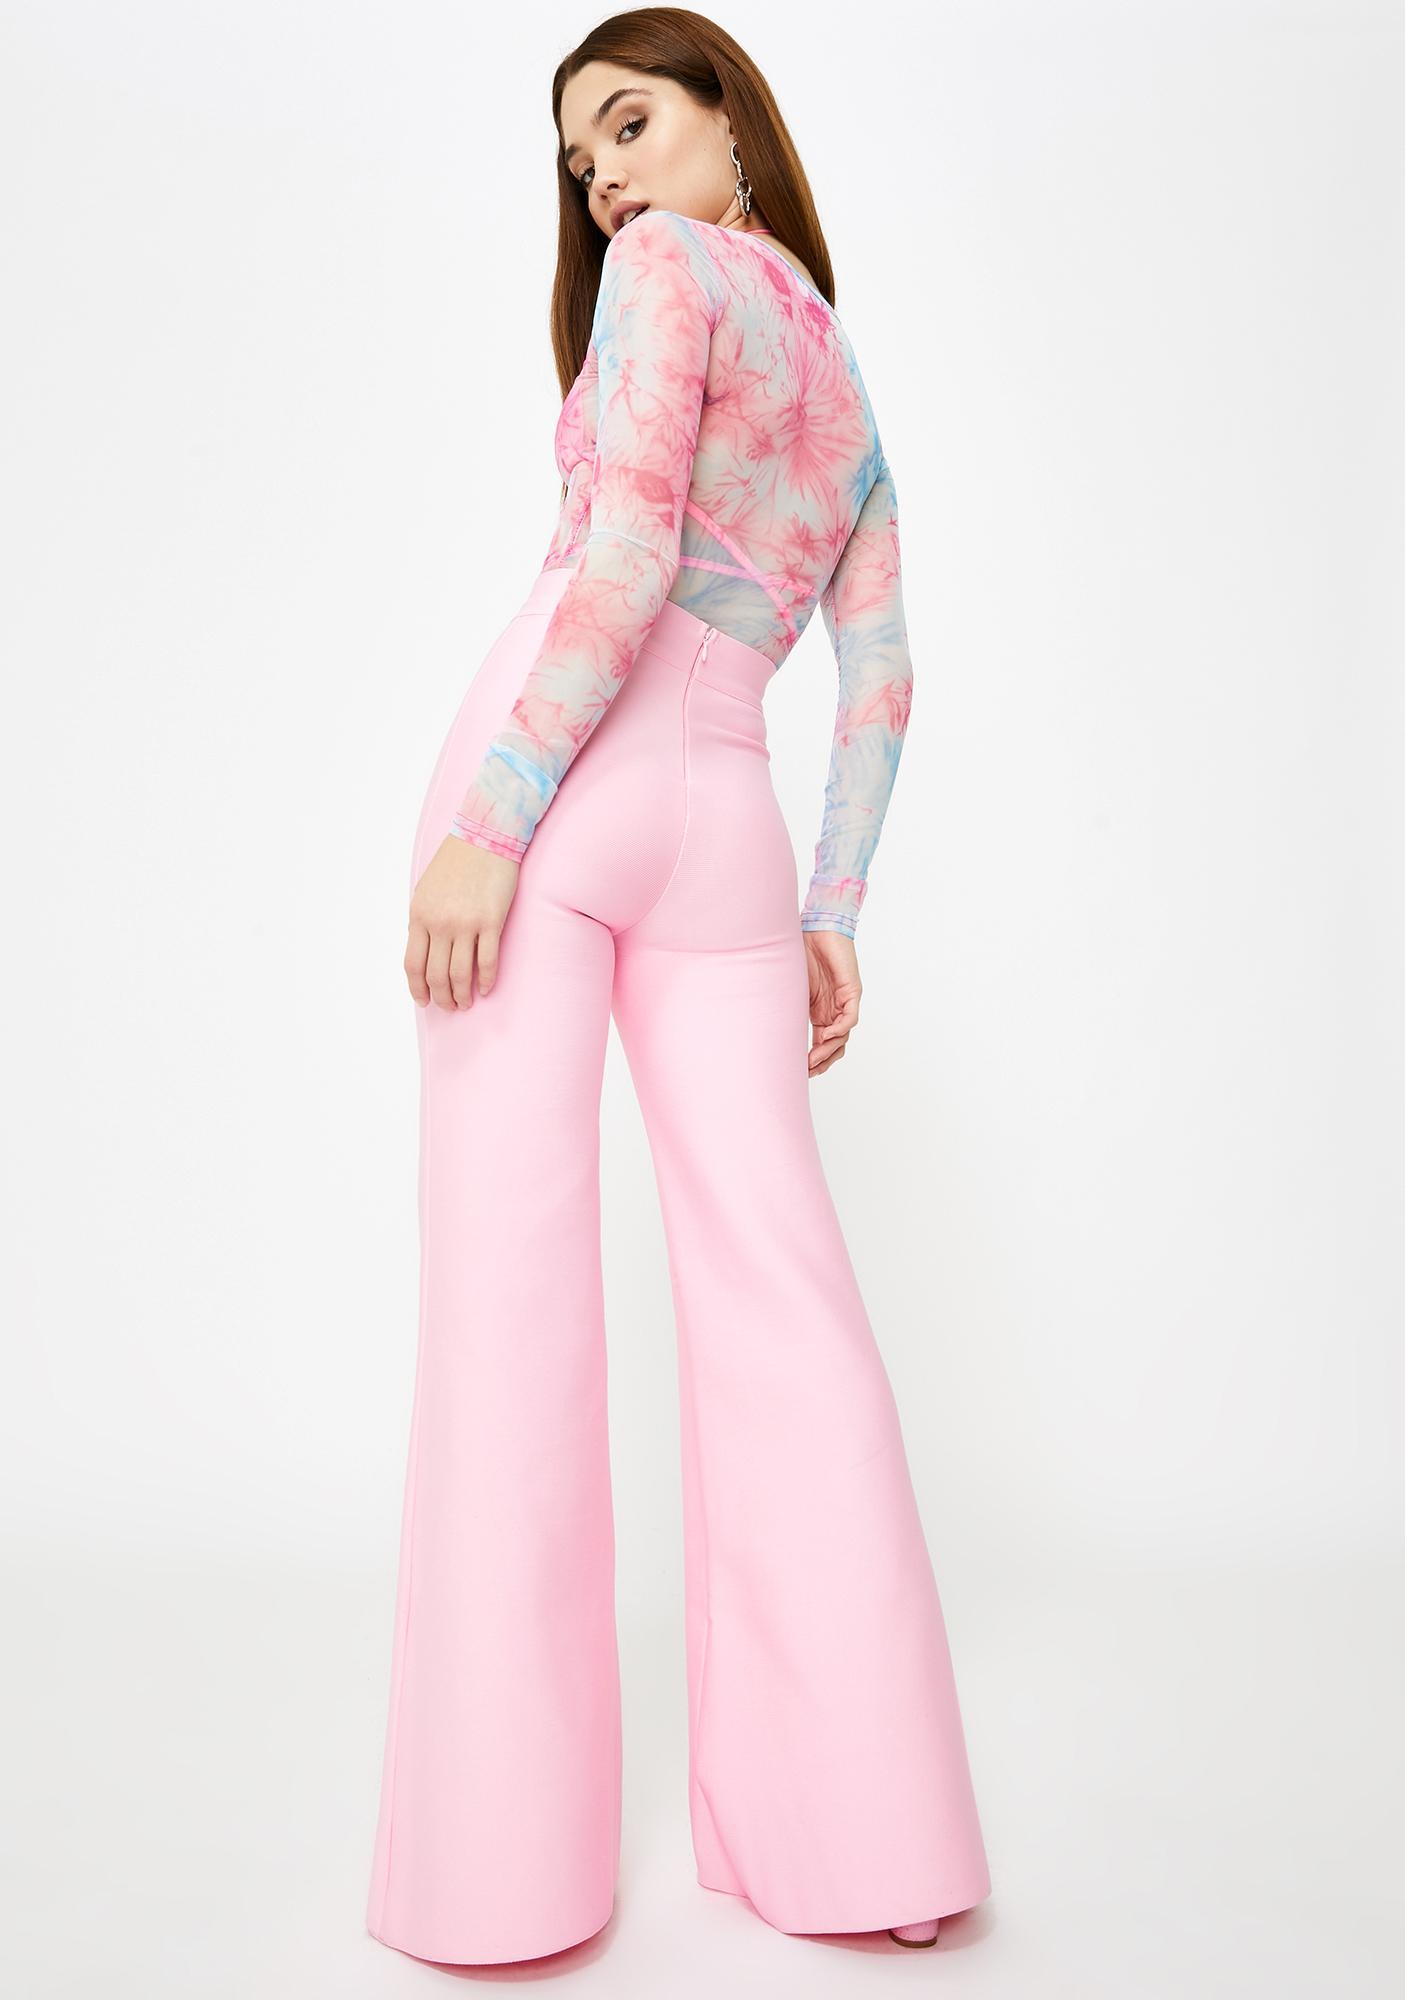 Tiger Mist Pink Sylvia Flared Pants